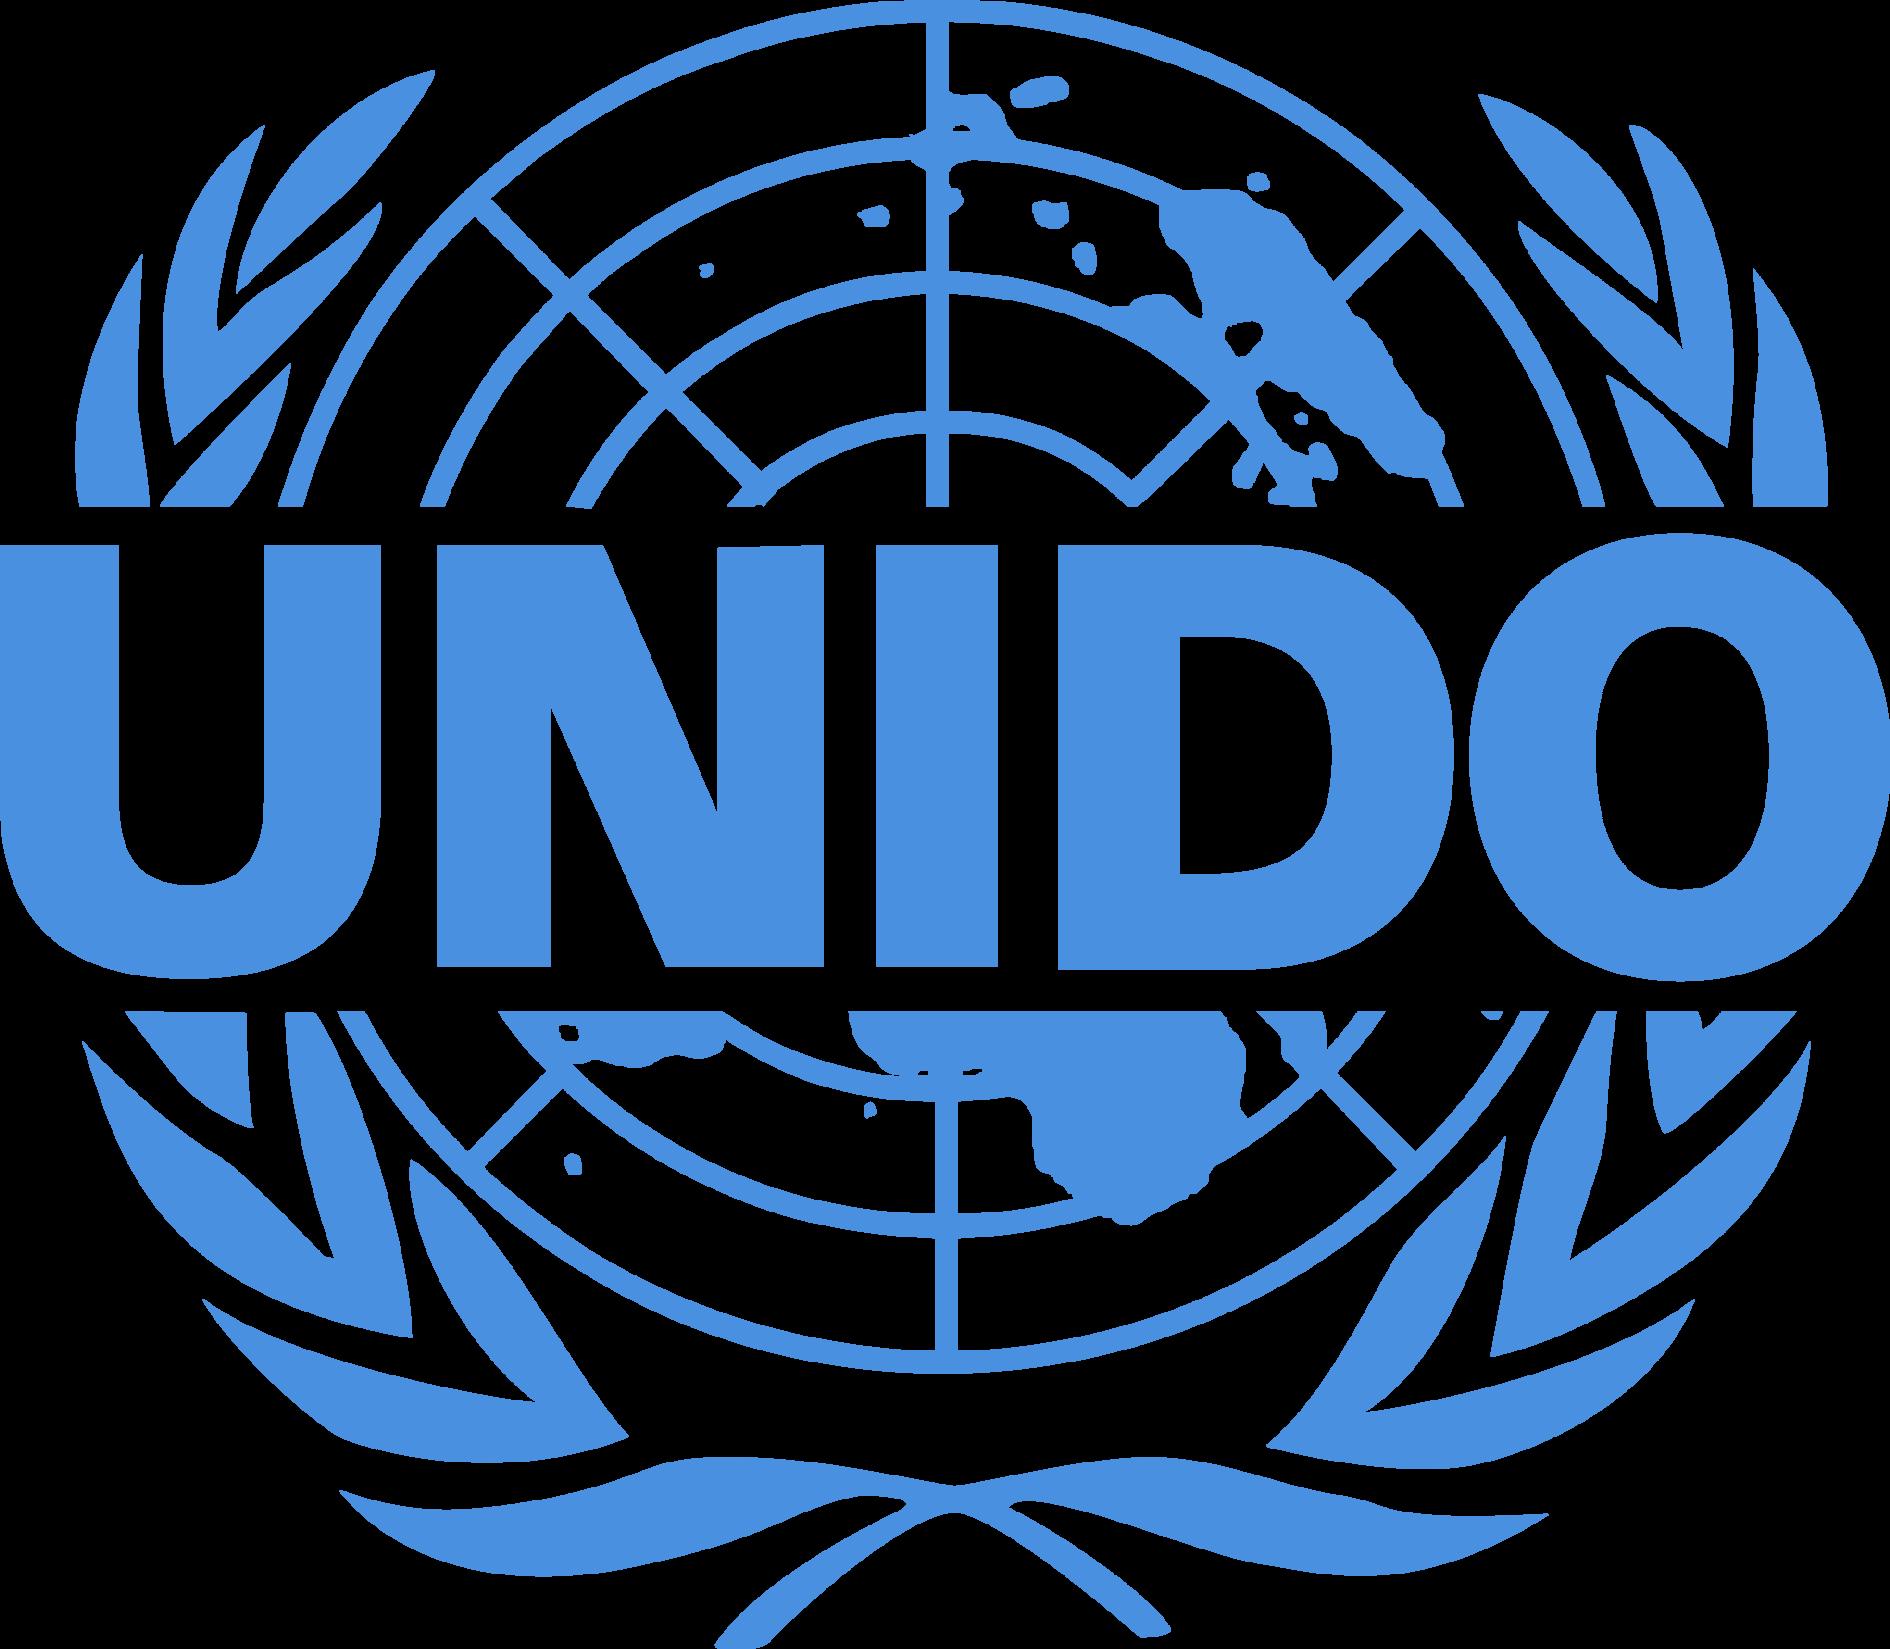 UNIDO Logo png